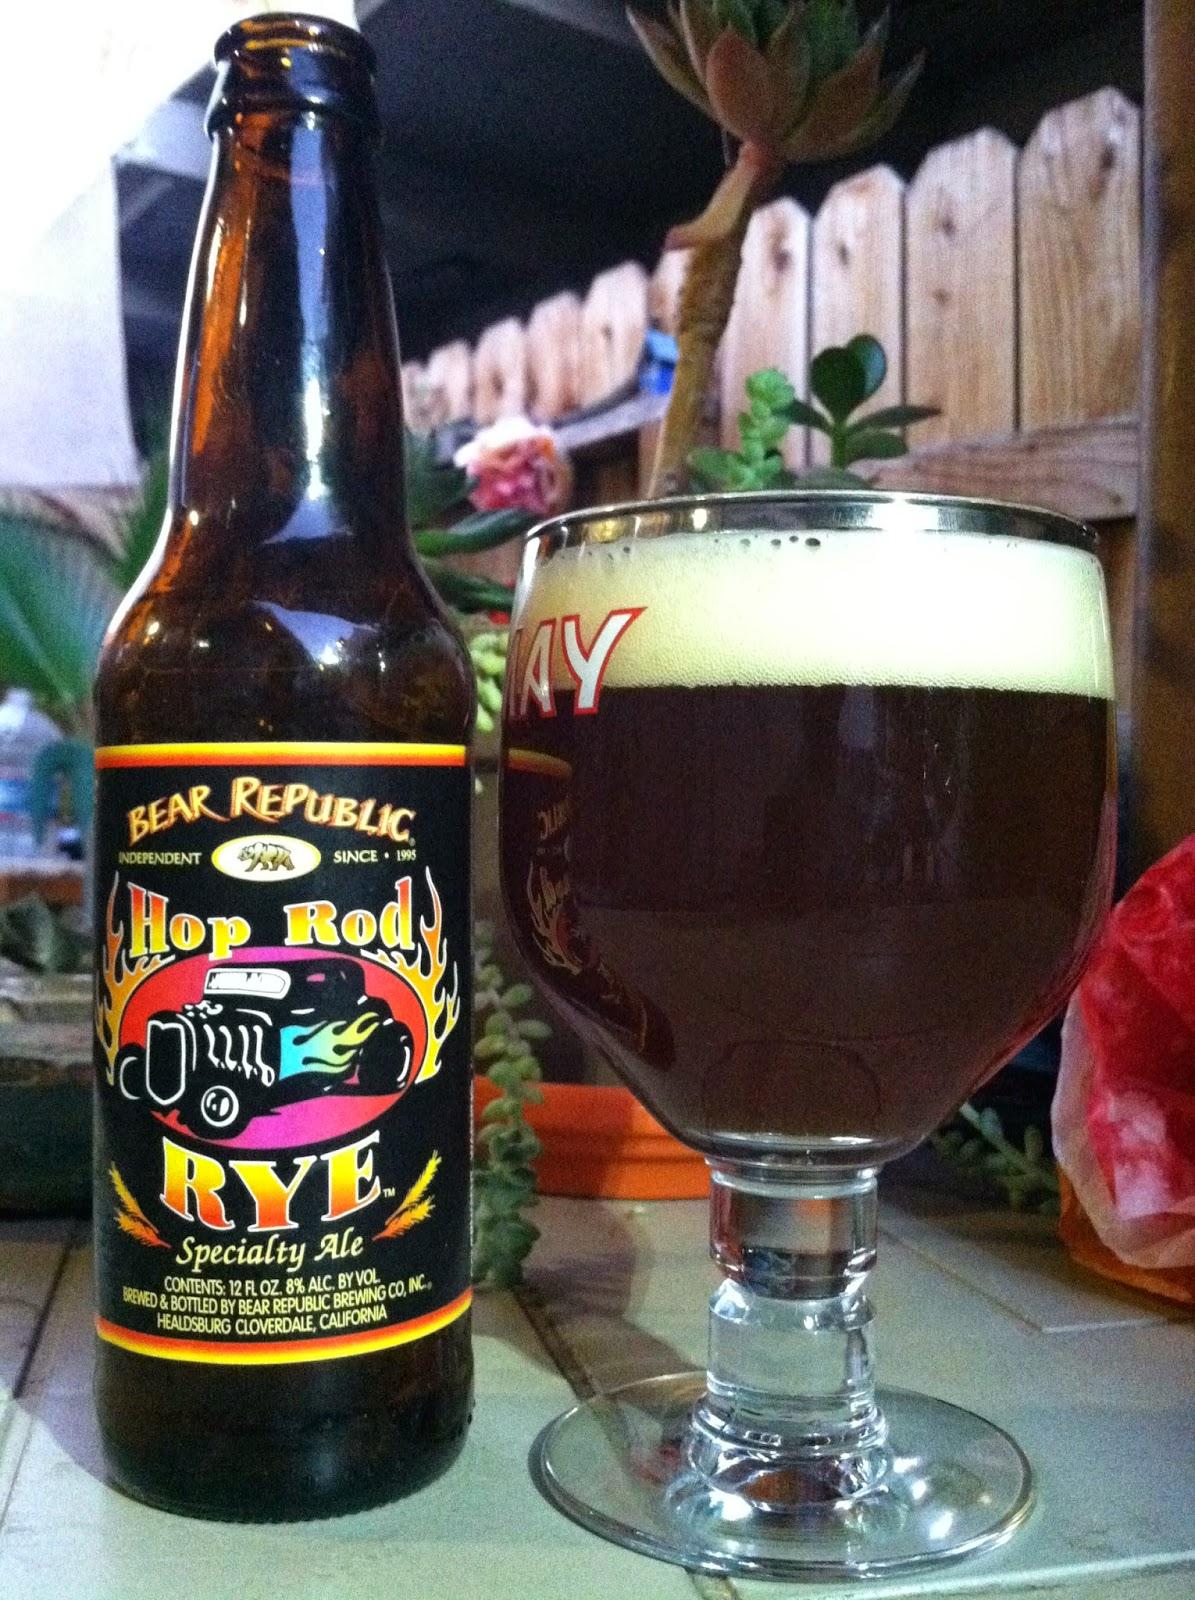 Bear Republic Hop Rod Rye 1